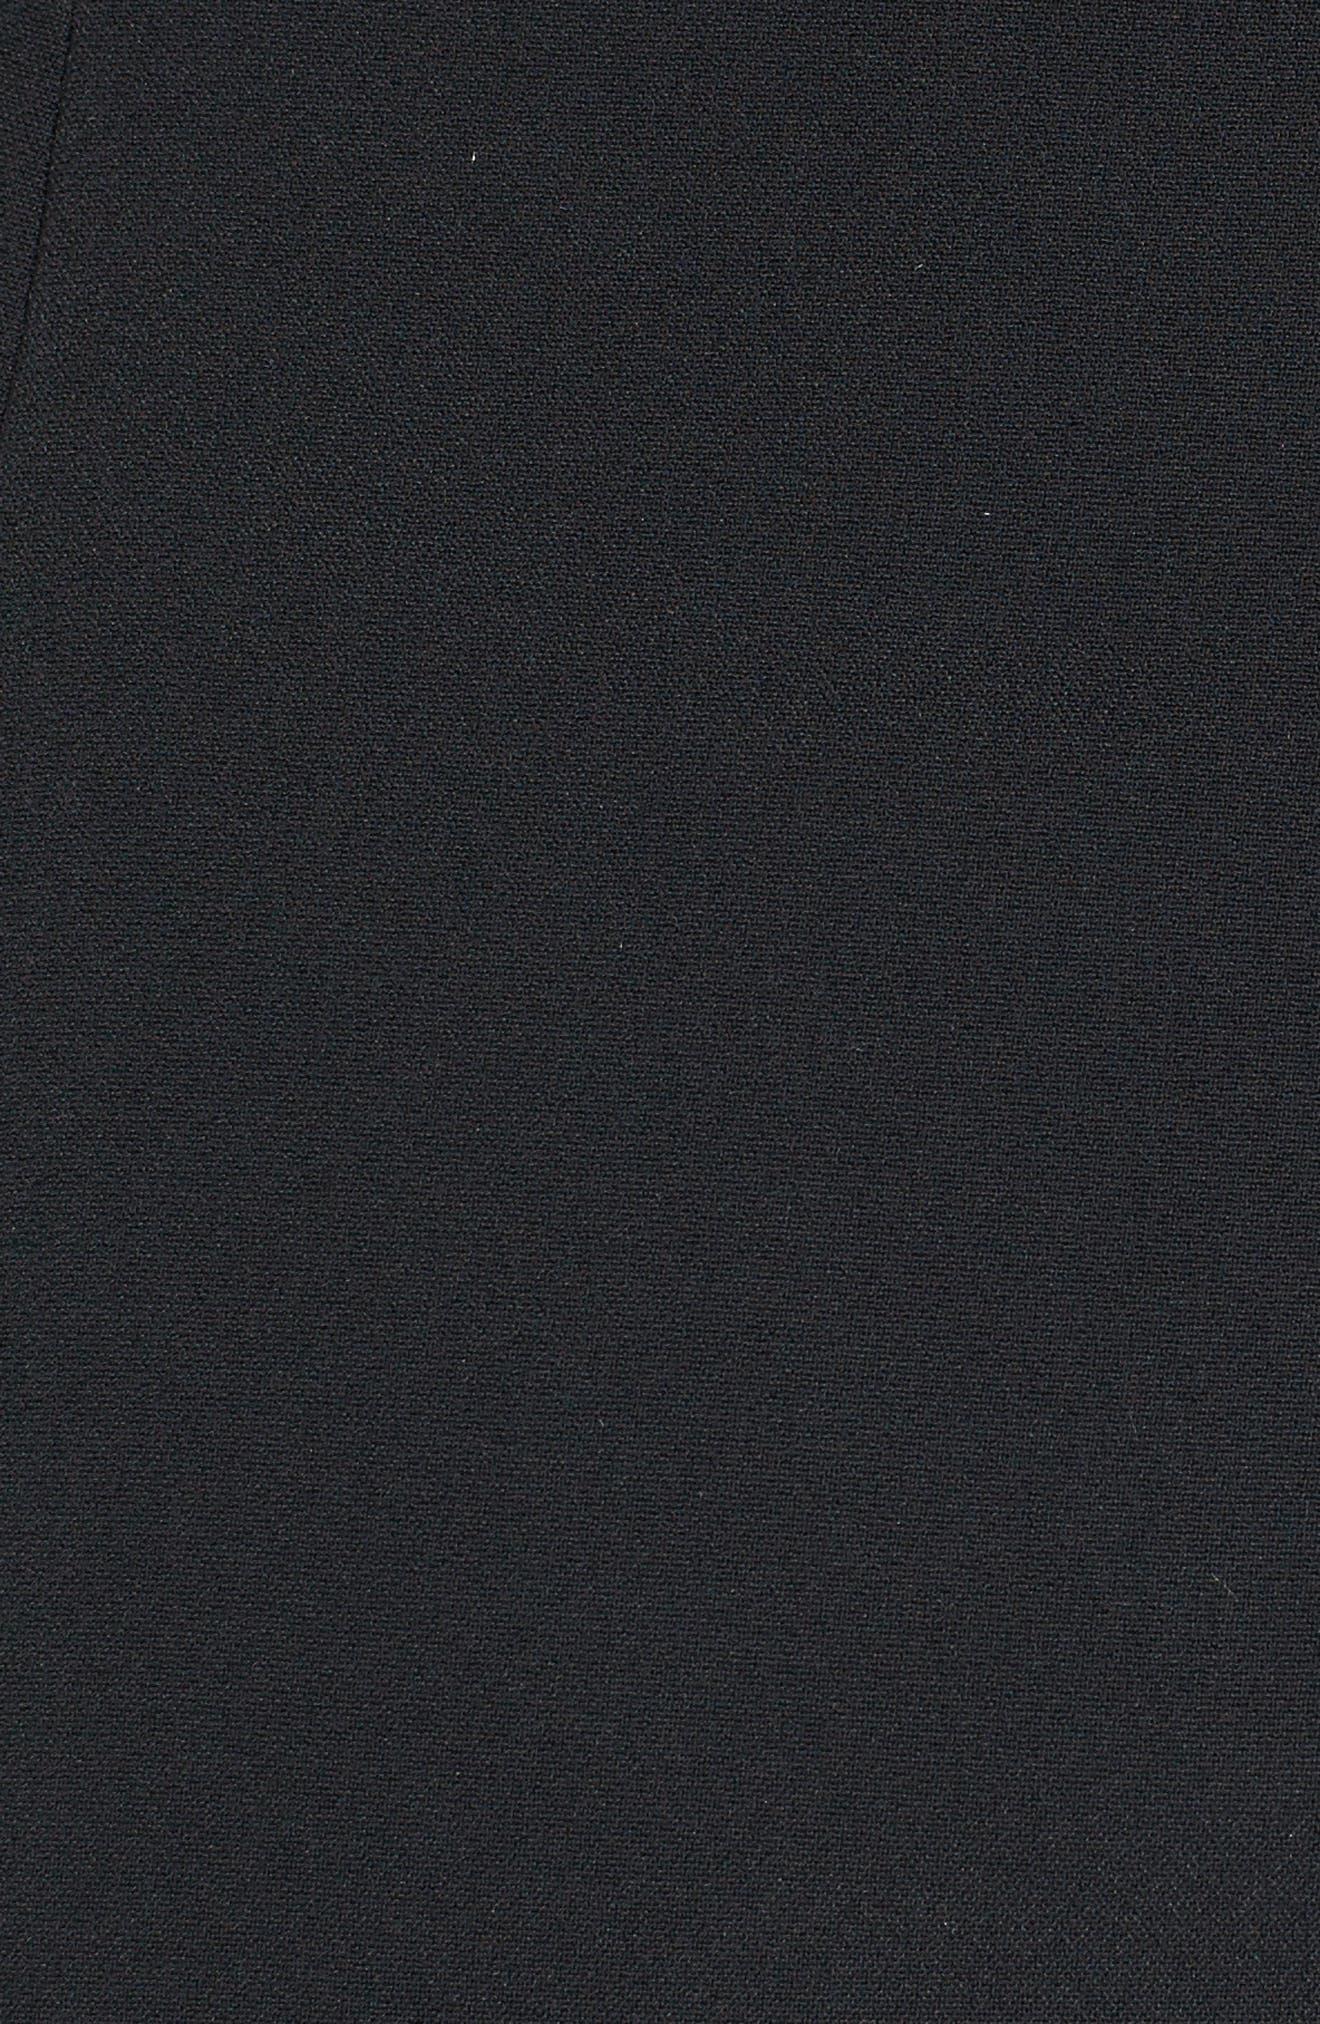 Mesh Yoke Stretch Cady Sheath Dress,                             Alternate thumbnail 5, color,                             BLACK